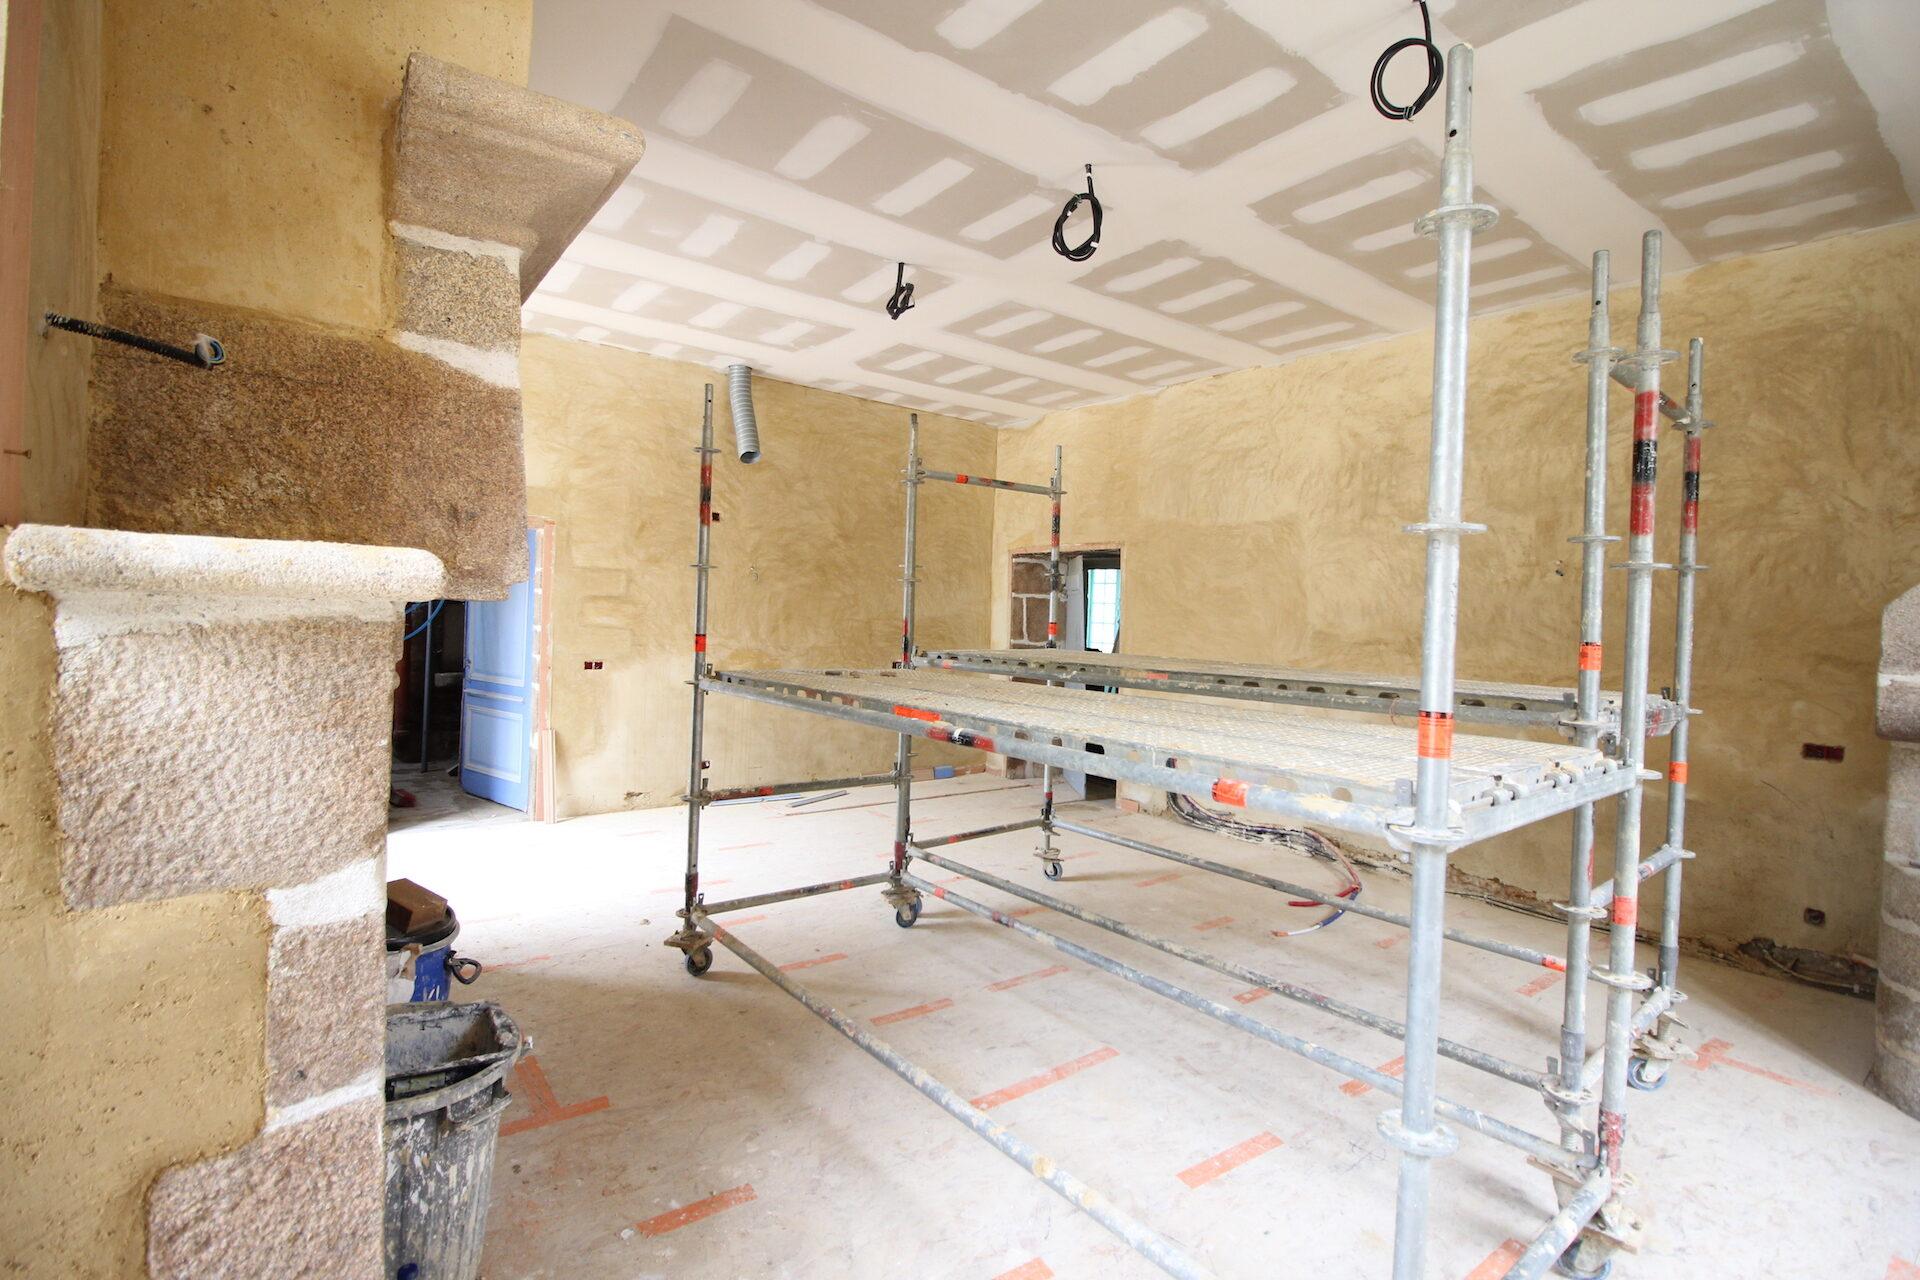 CSDK Lissage de murs en terre Bretagne 1 1920x1280 - Engagement durable - CSDK Lissage de murs en terre Bretagne 1 1920x1280